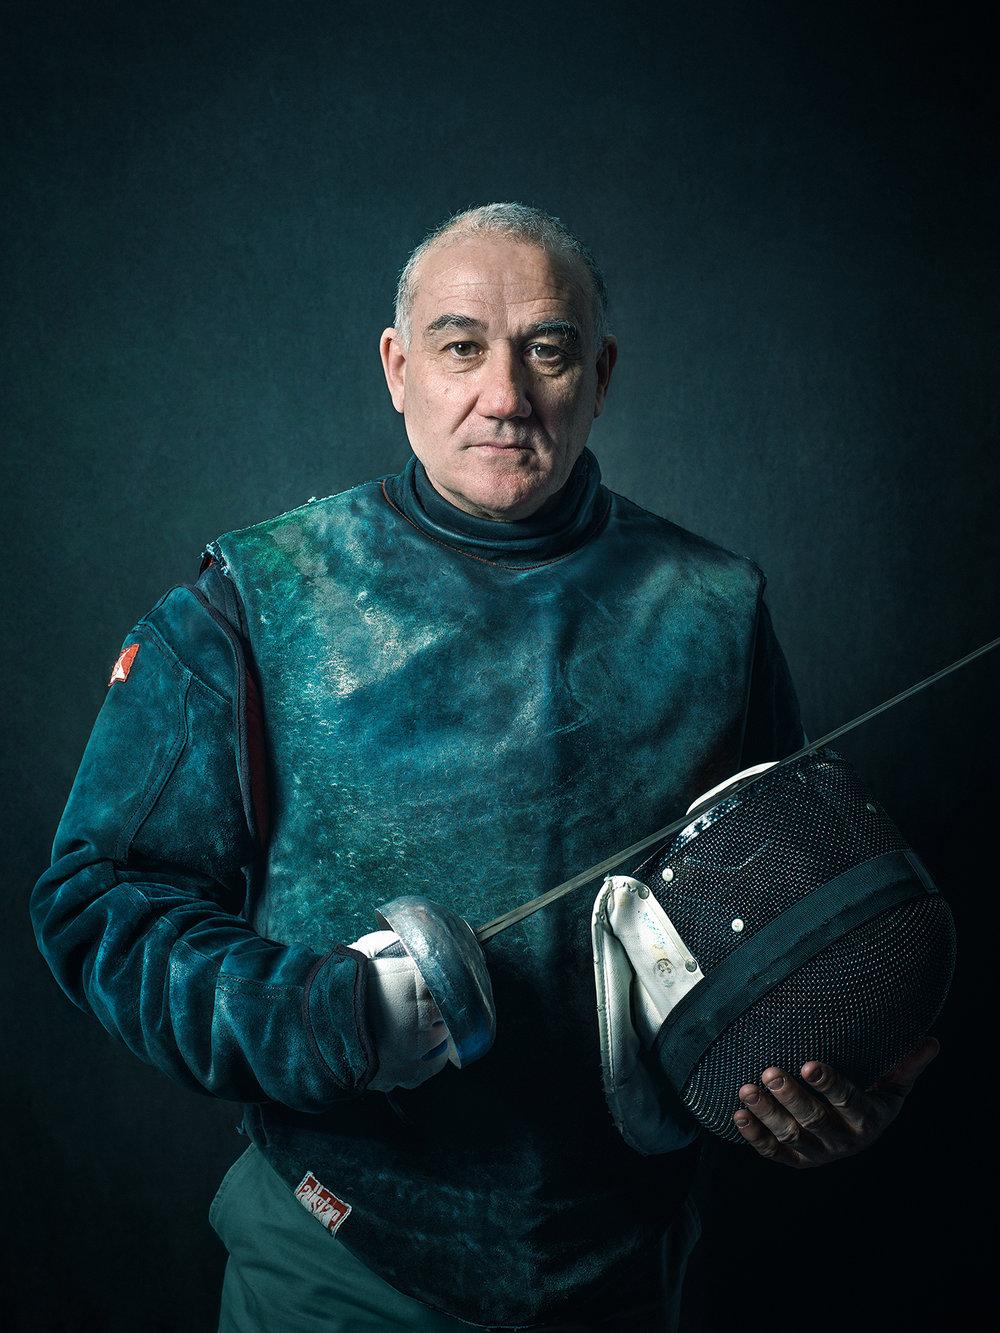 Oscar-arribas-esgrima-maestro-fencing-master-fencer-fechten-scherma-escrime-portrait-fotografo-retrato-photographer008.jpg